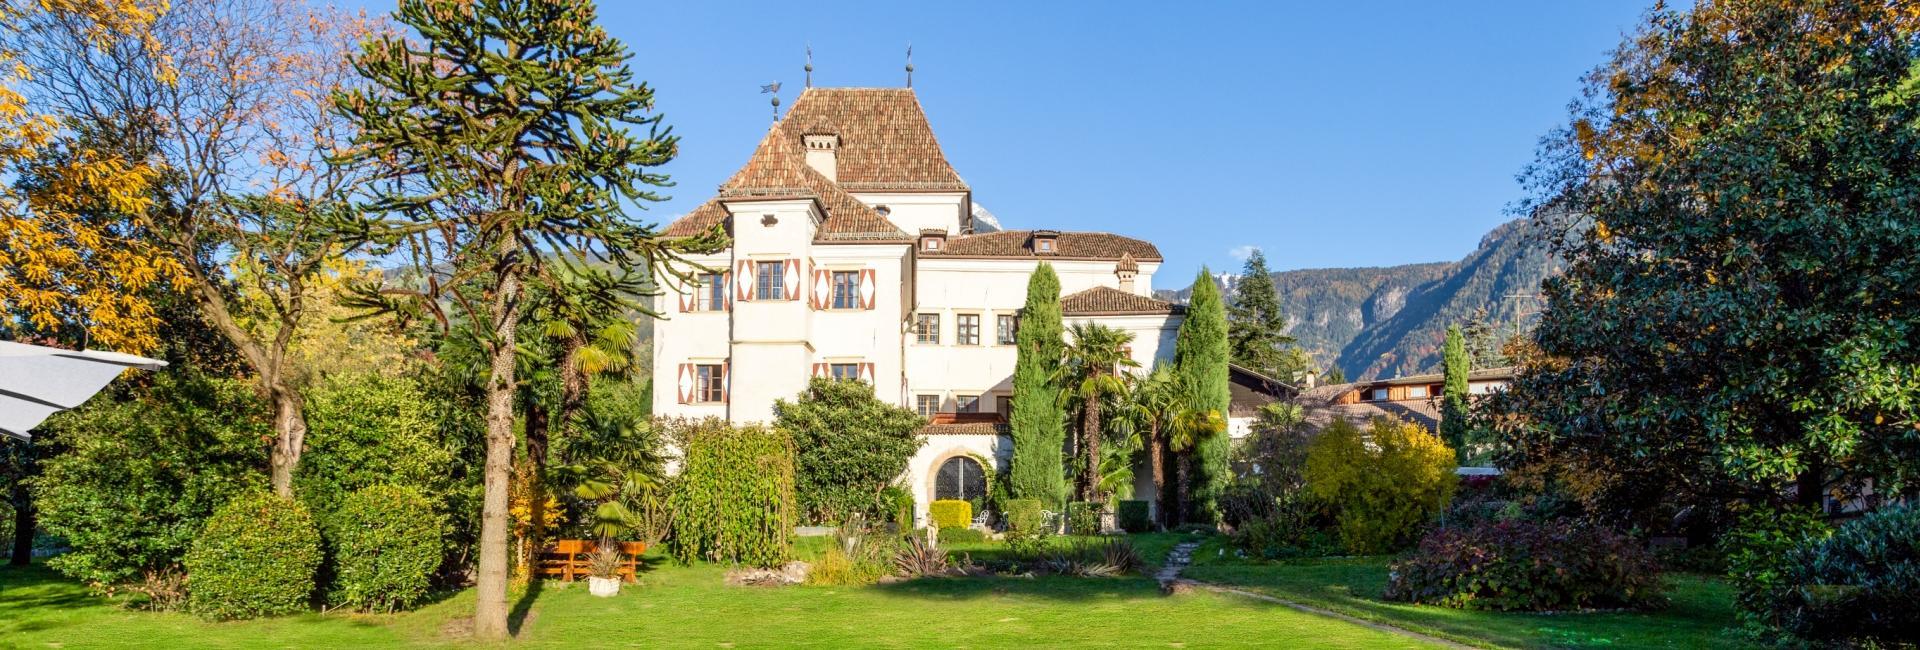 Hotel Castel Rundegg in Merano